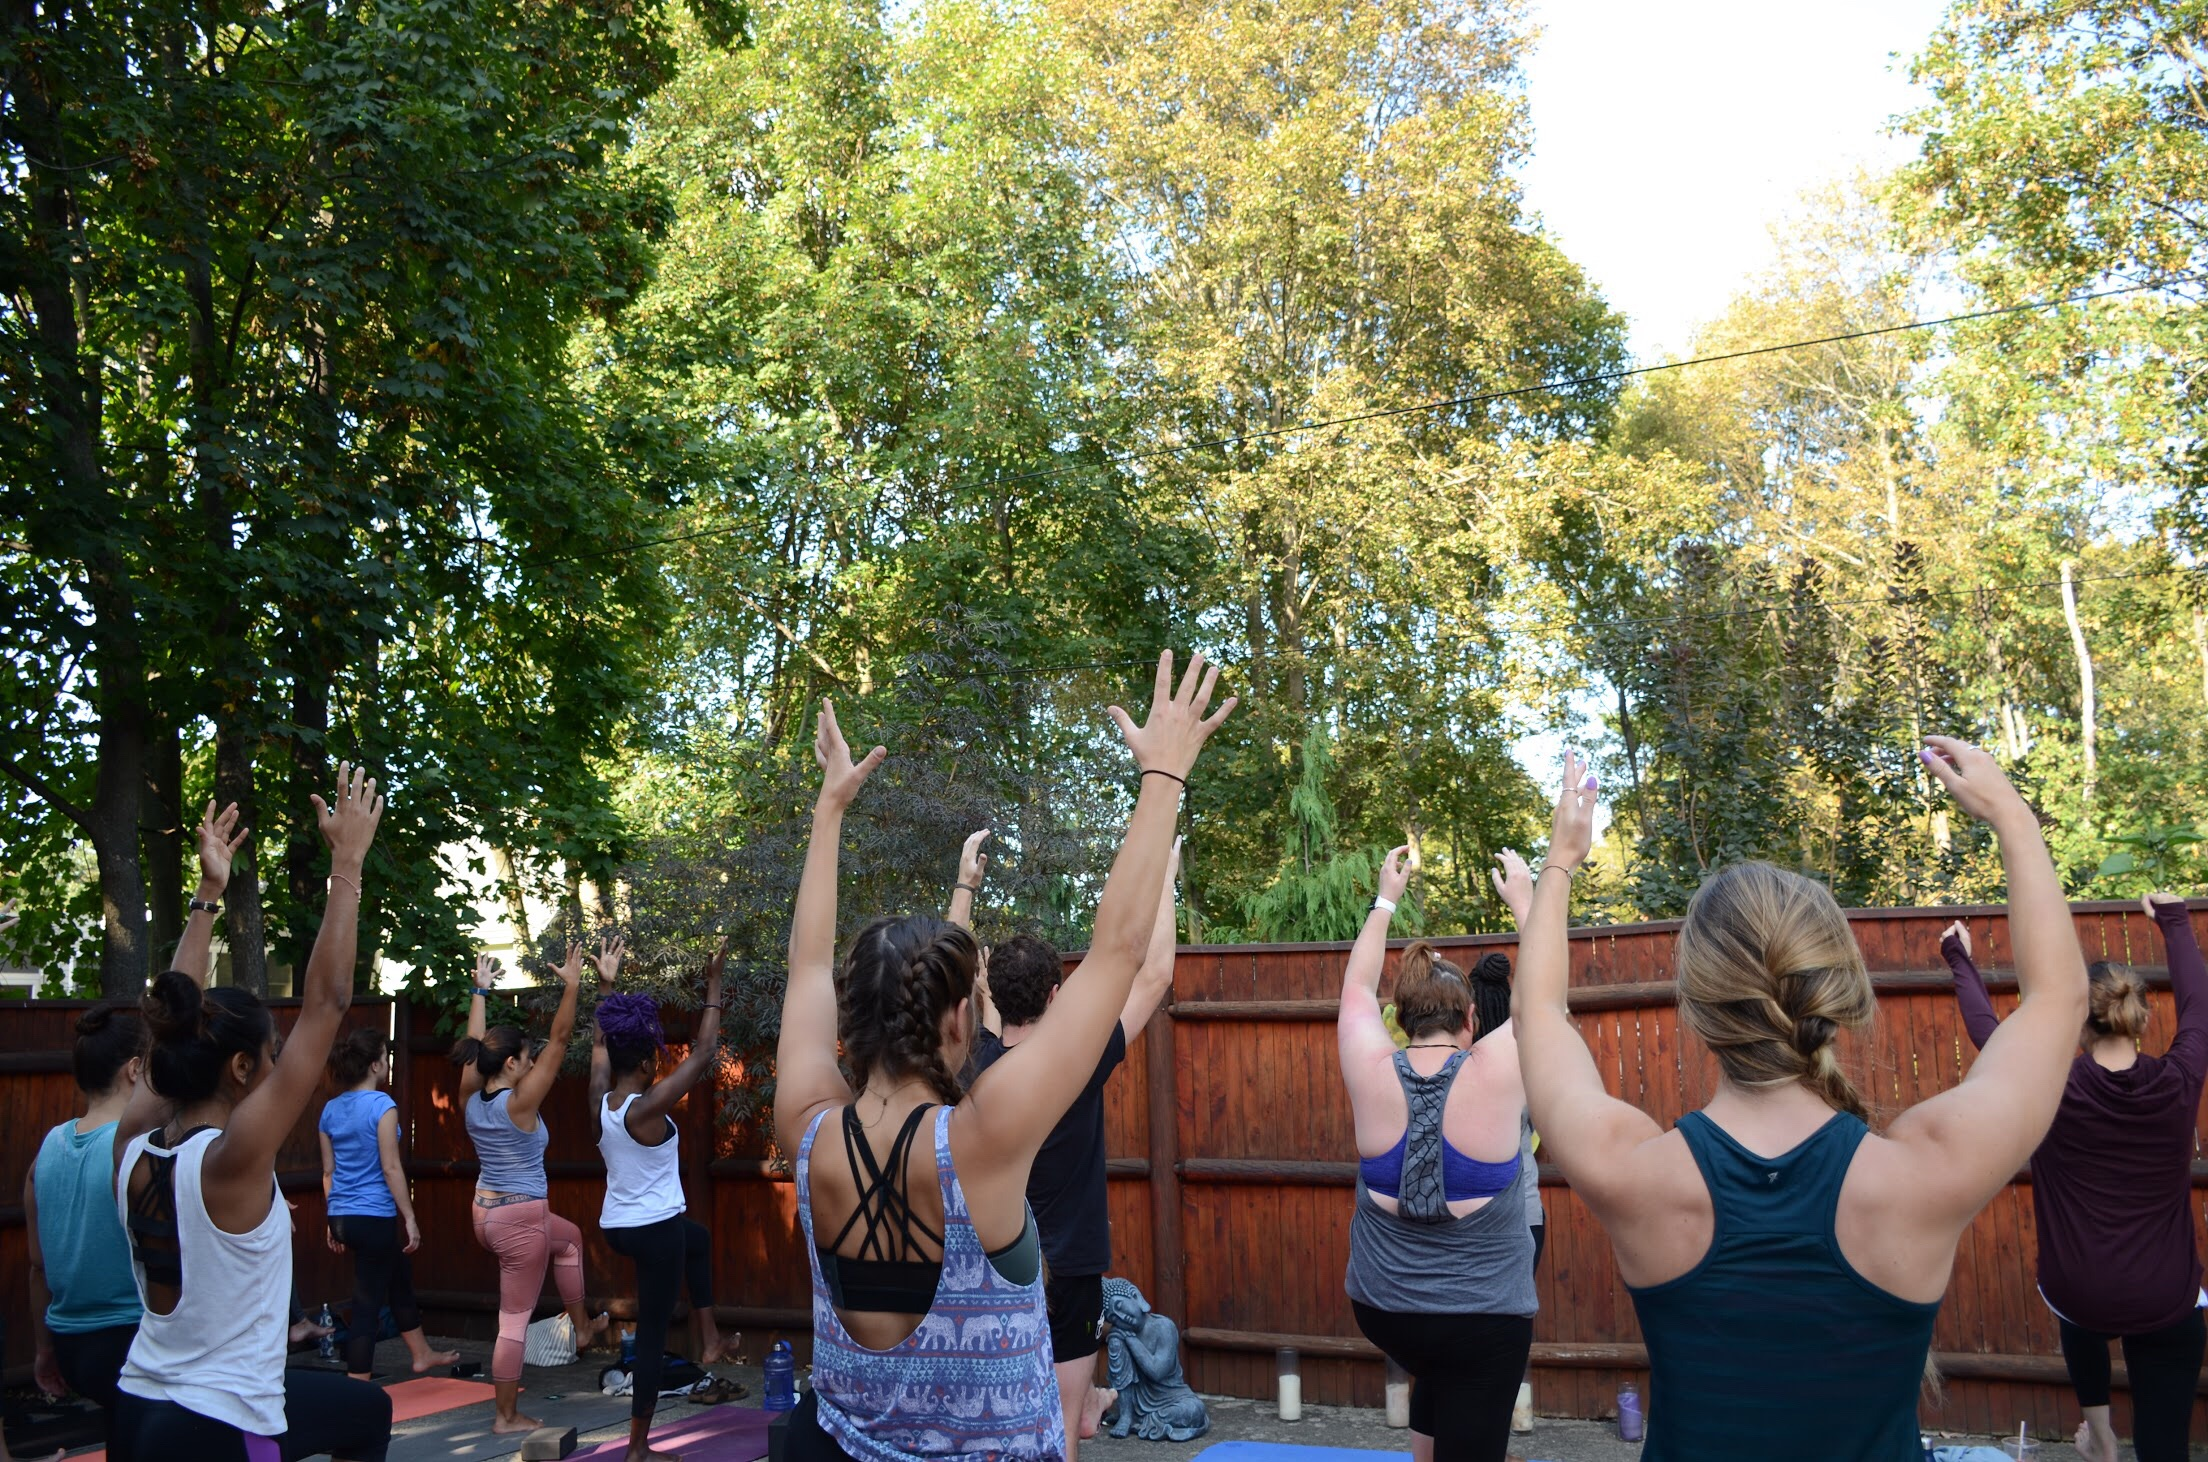 Review of Ganja Yoga Class